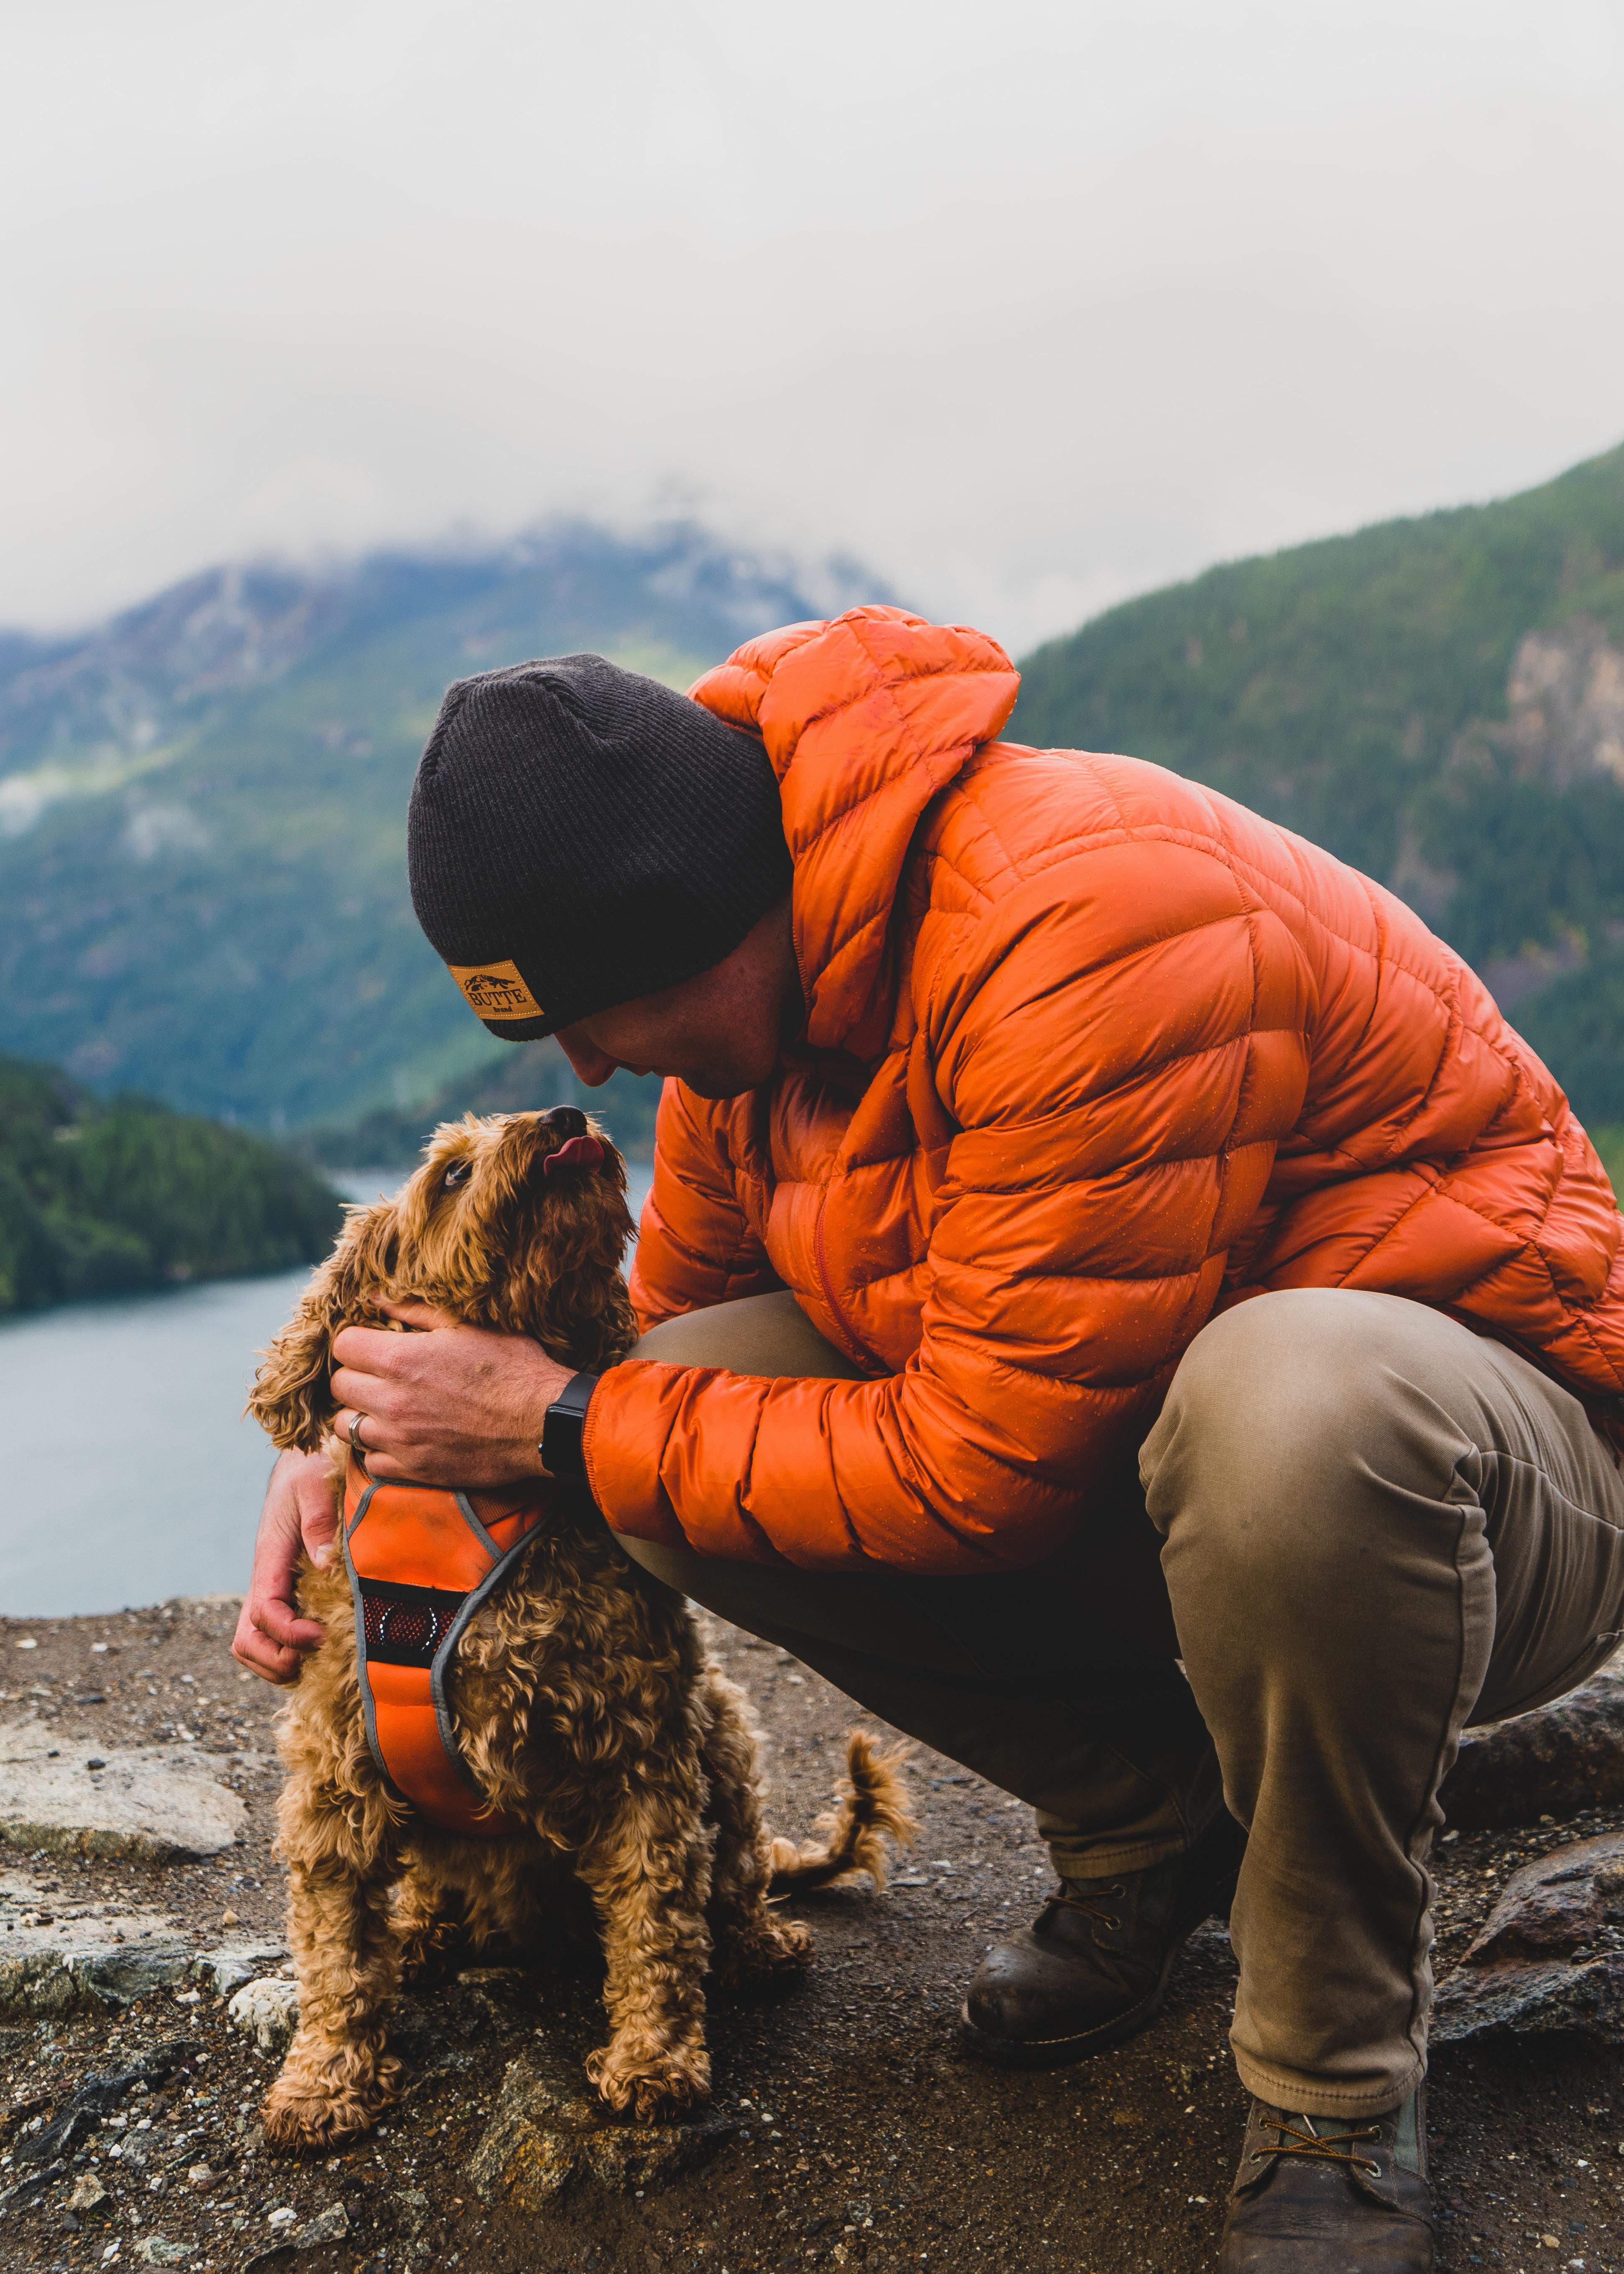 man-in-orange-hoodie-and-black-knit-cap-sitting-on-rock-beside-brown-long-coated-dog